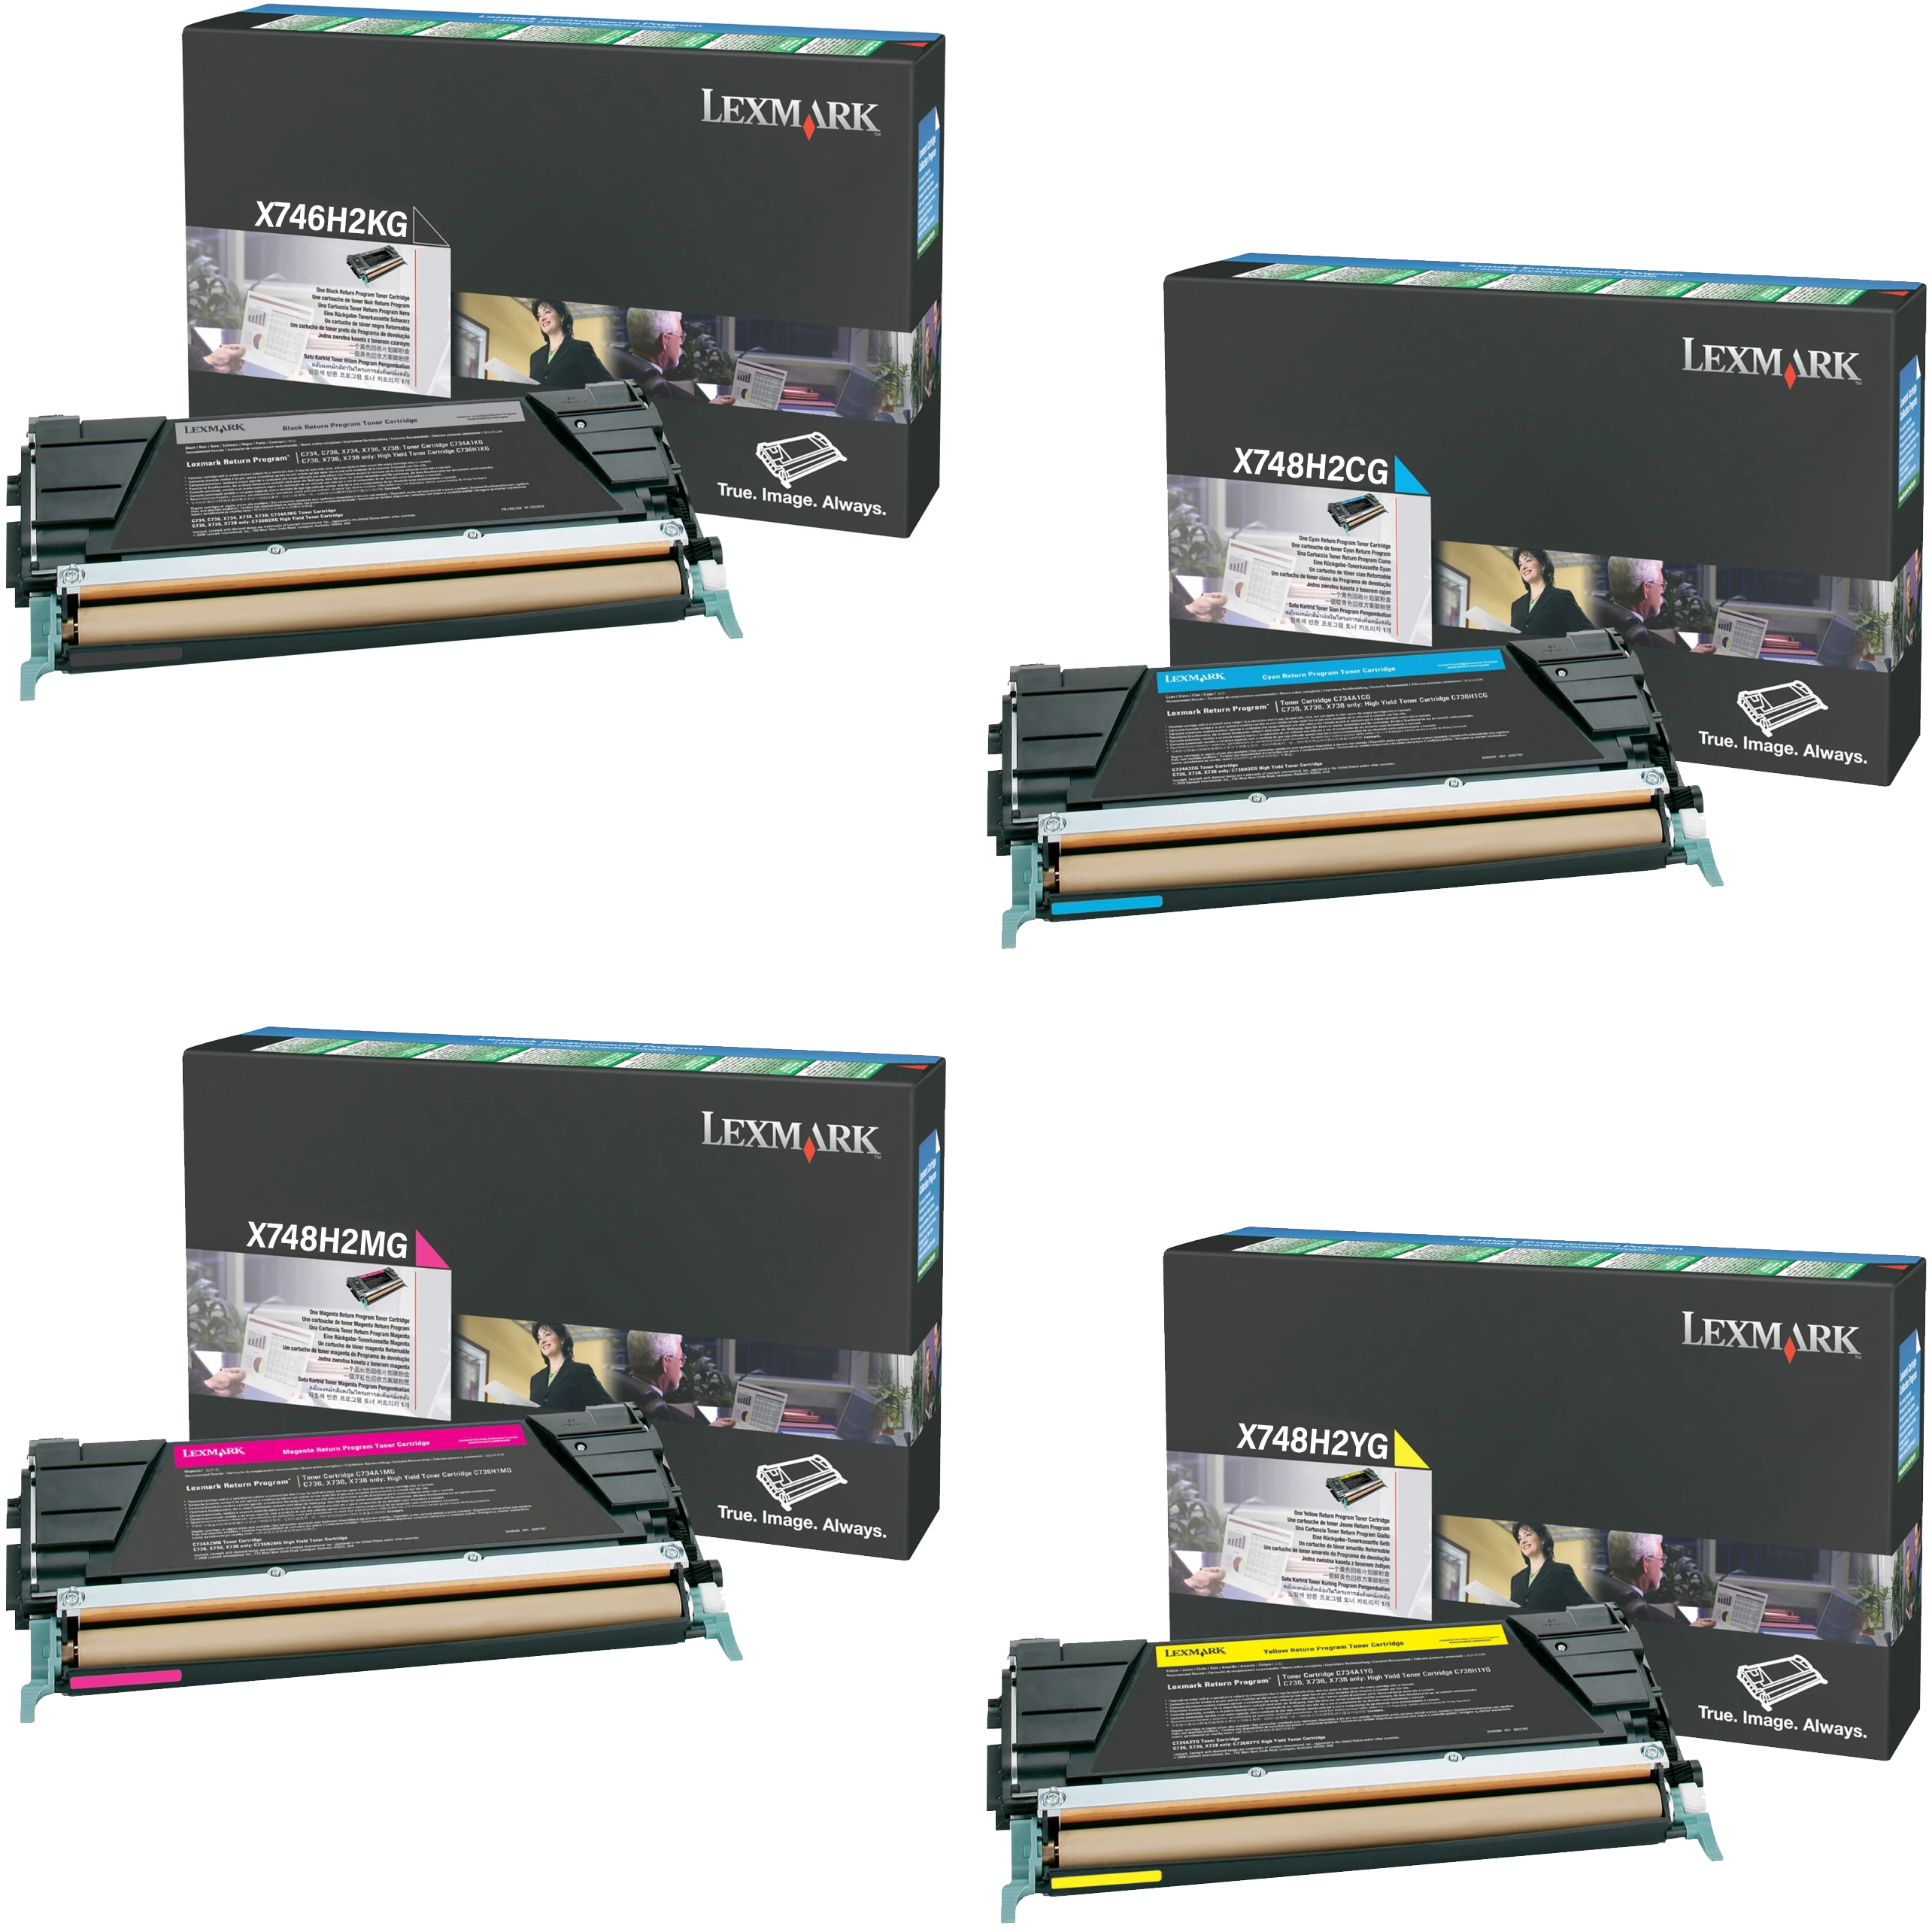 Lexmark X748H2 Set | X746H2KG X748H2CG X748H2MG X748H2YG | Original Lexmark High-Yield Toner Cartridges – Black, Cyan, Magenta, Yellow